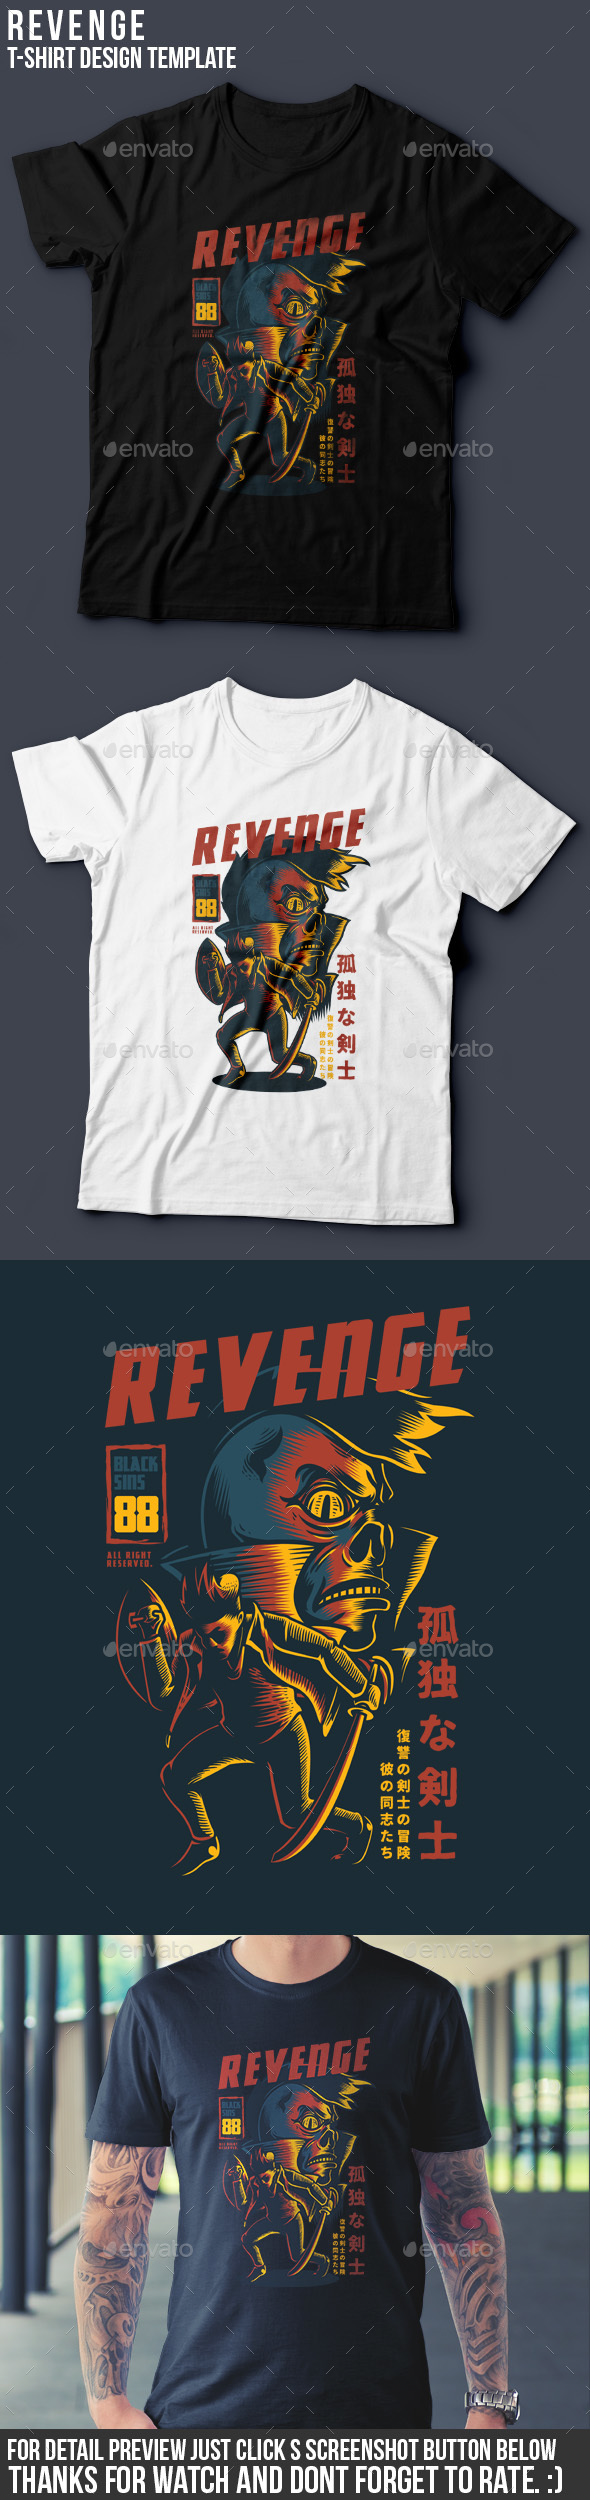 Revenge T-Shirt Design - Clean Designs